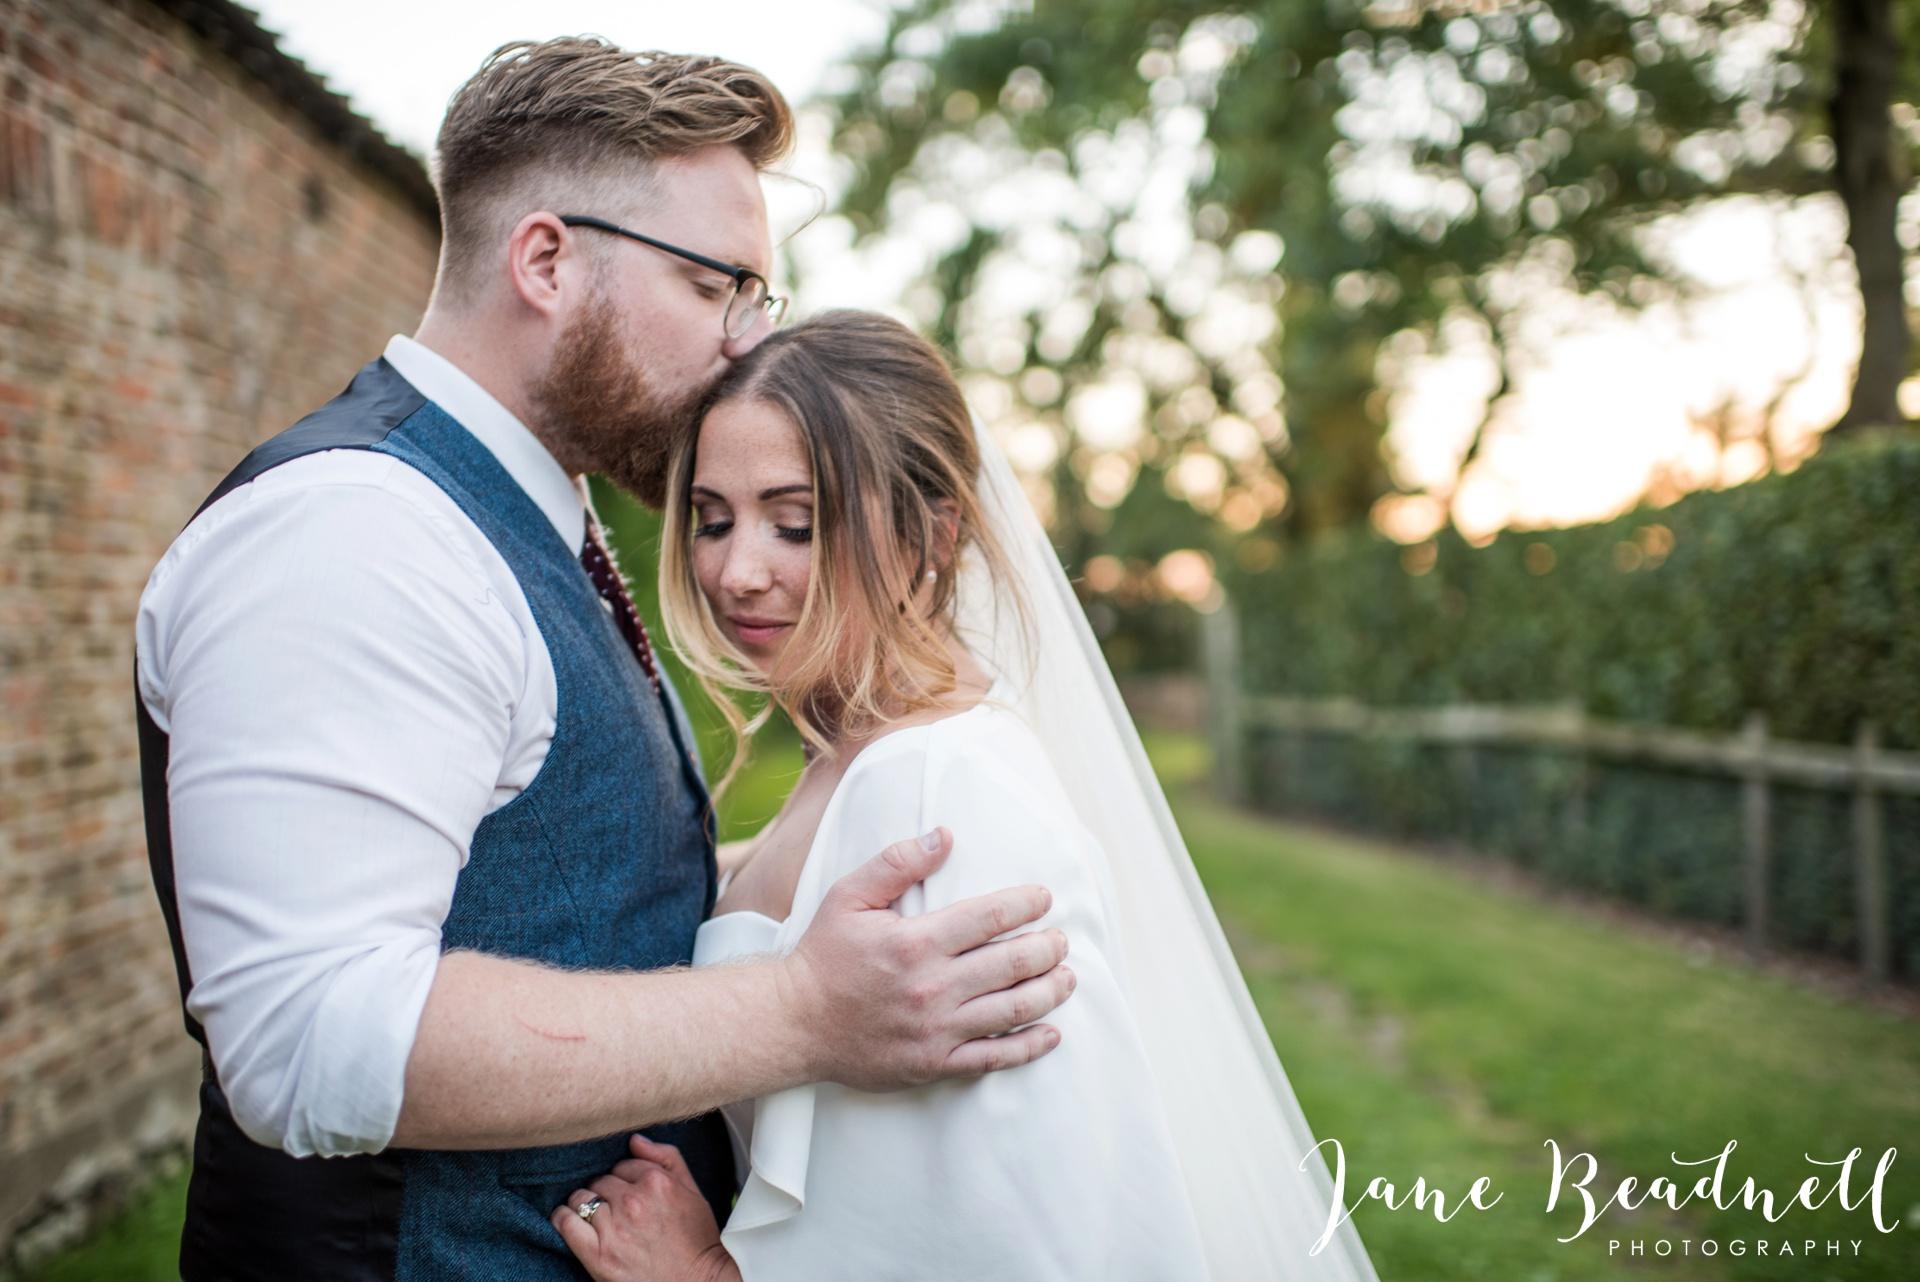 yorkshire-fine-art-wedding-photographer-jane-beadnell-photography_0015